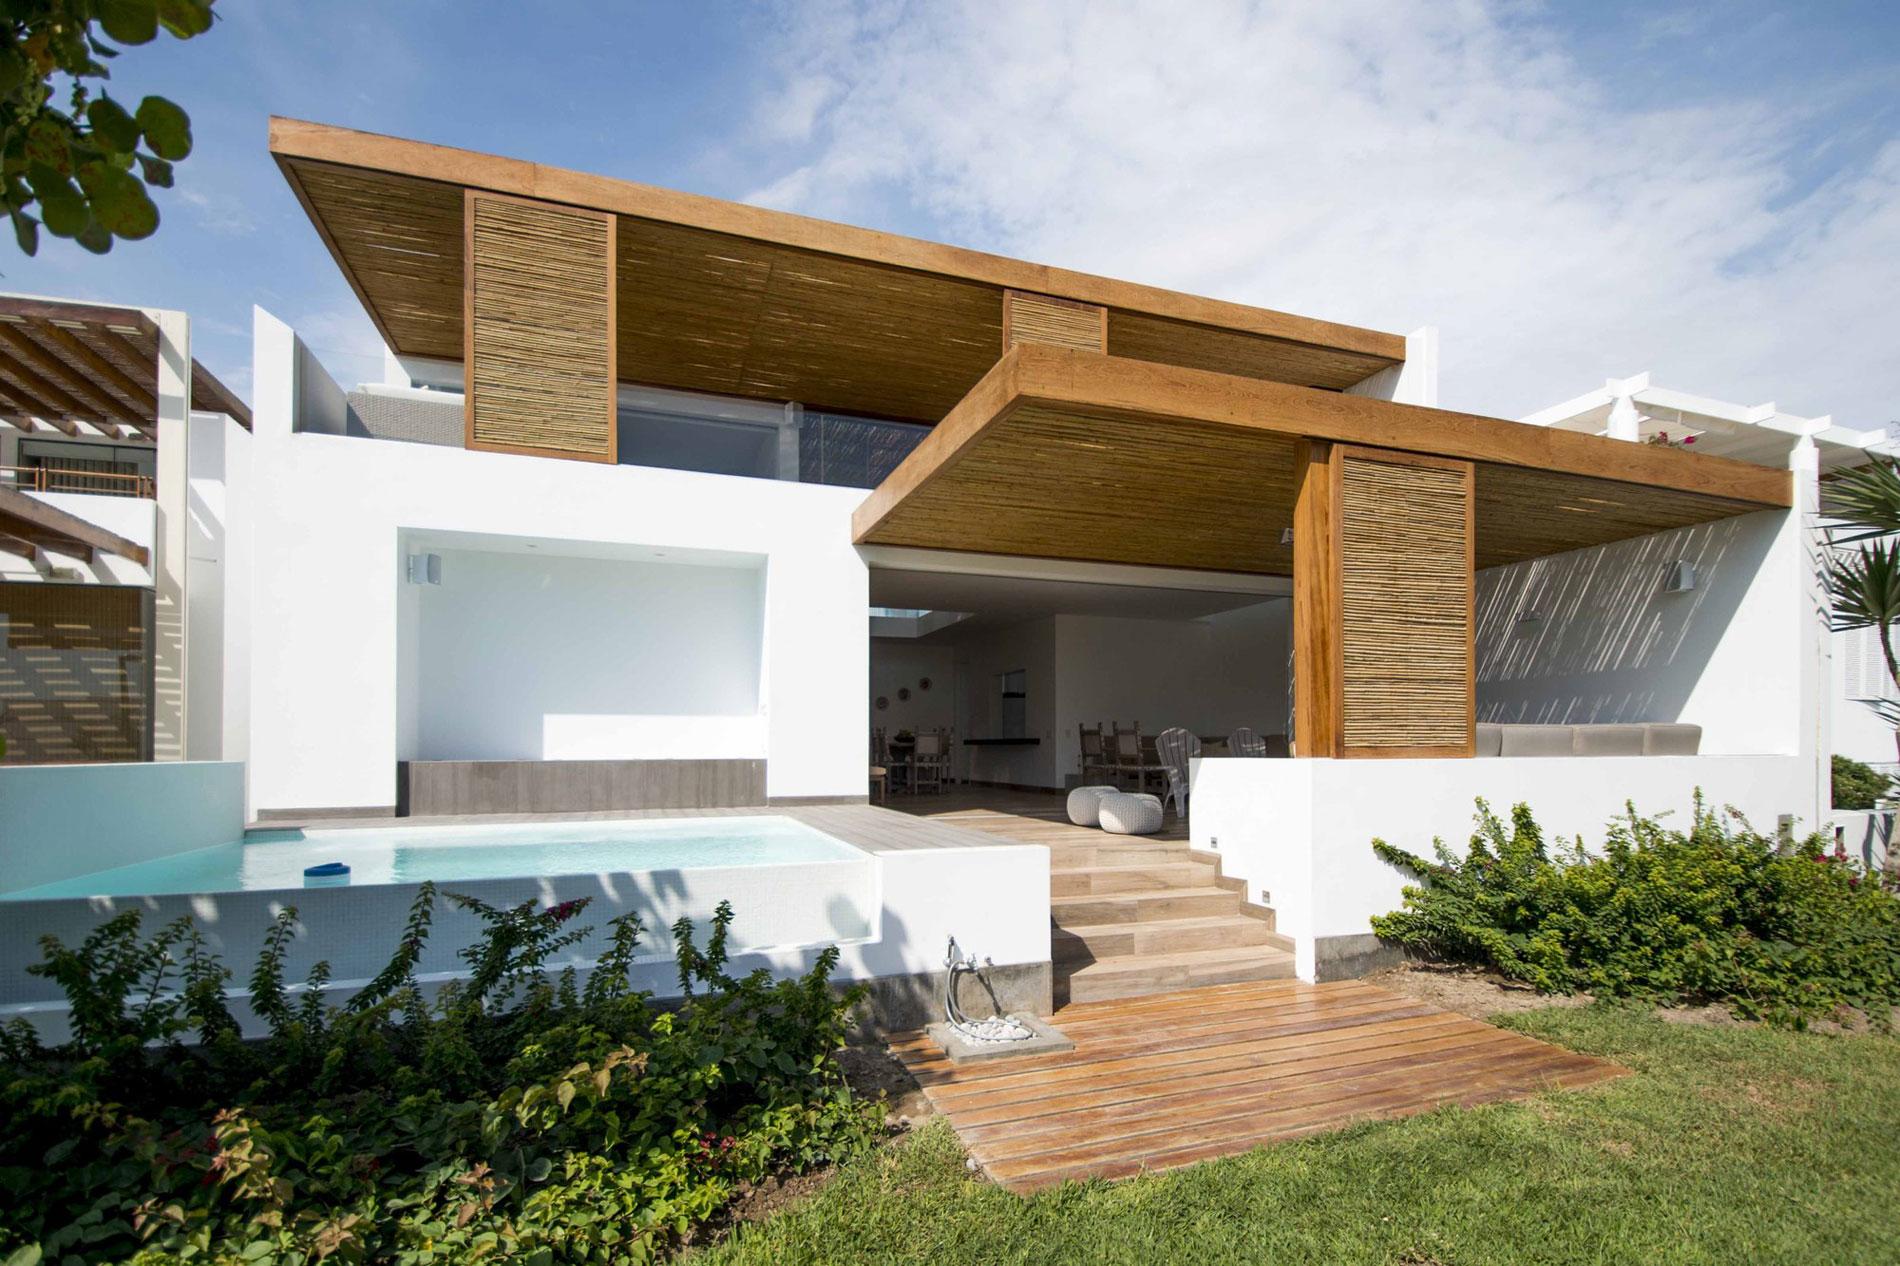 The-Panda-House-03